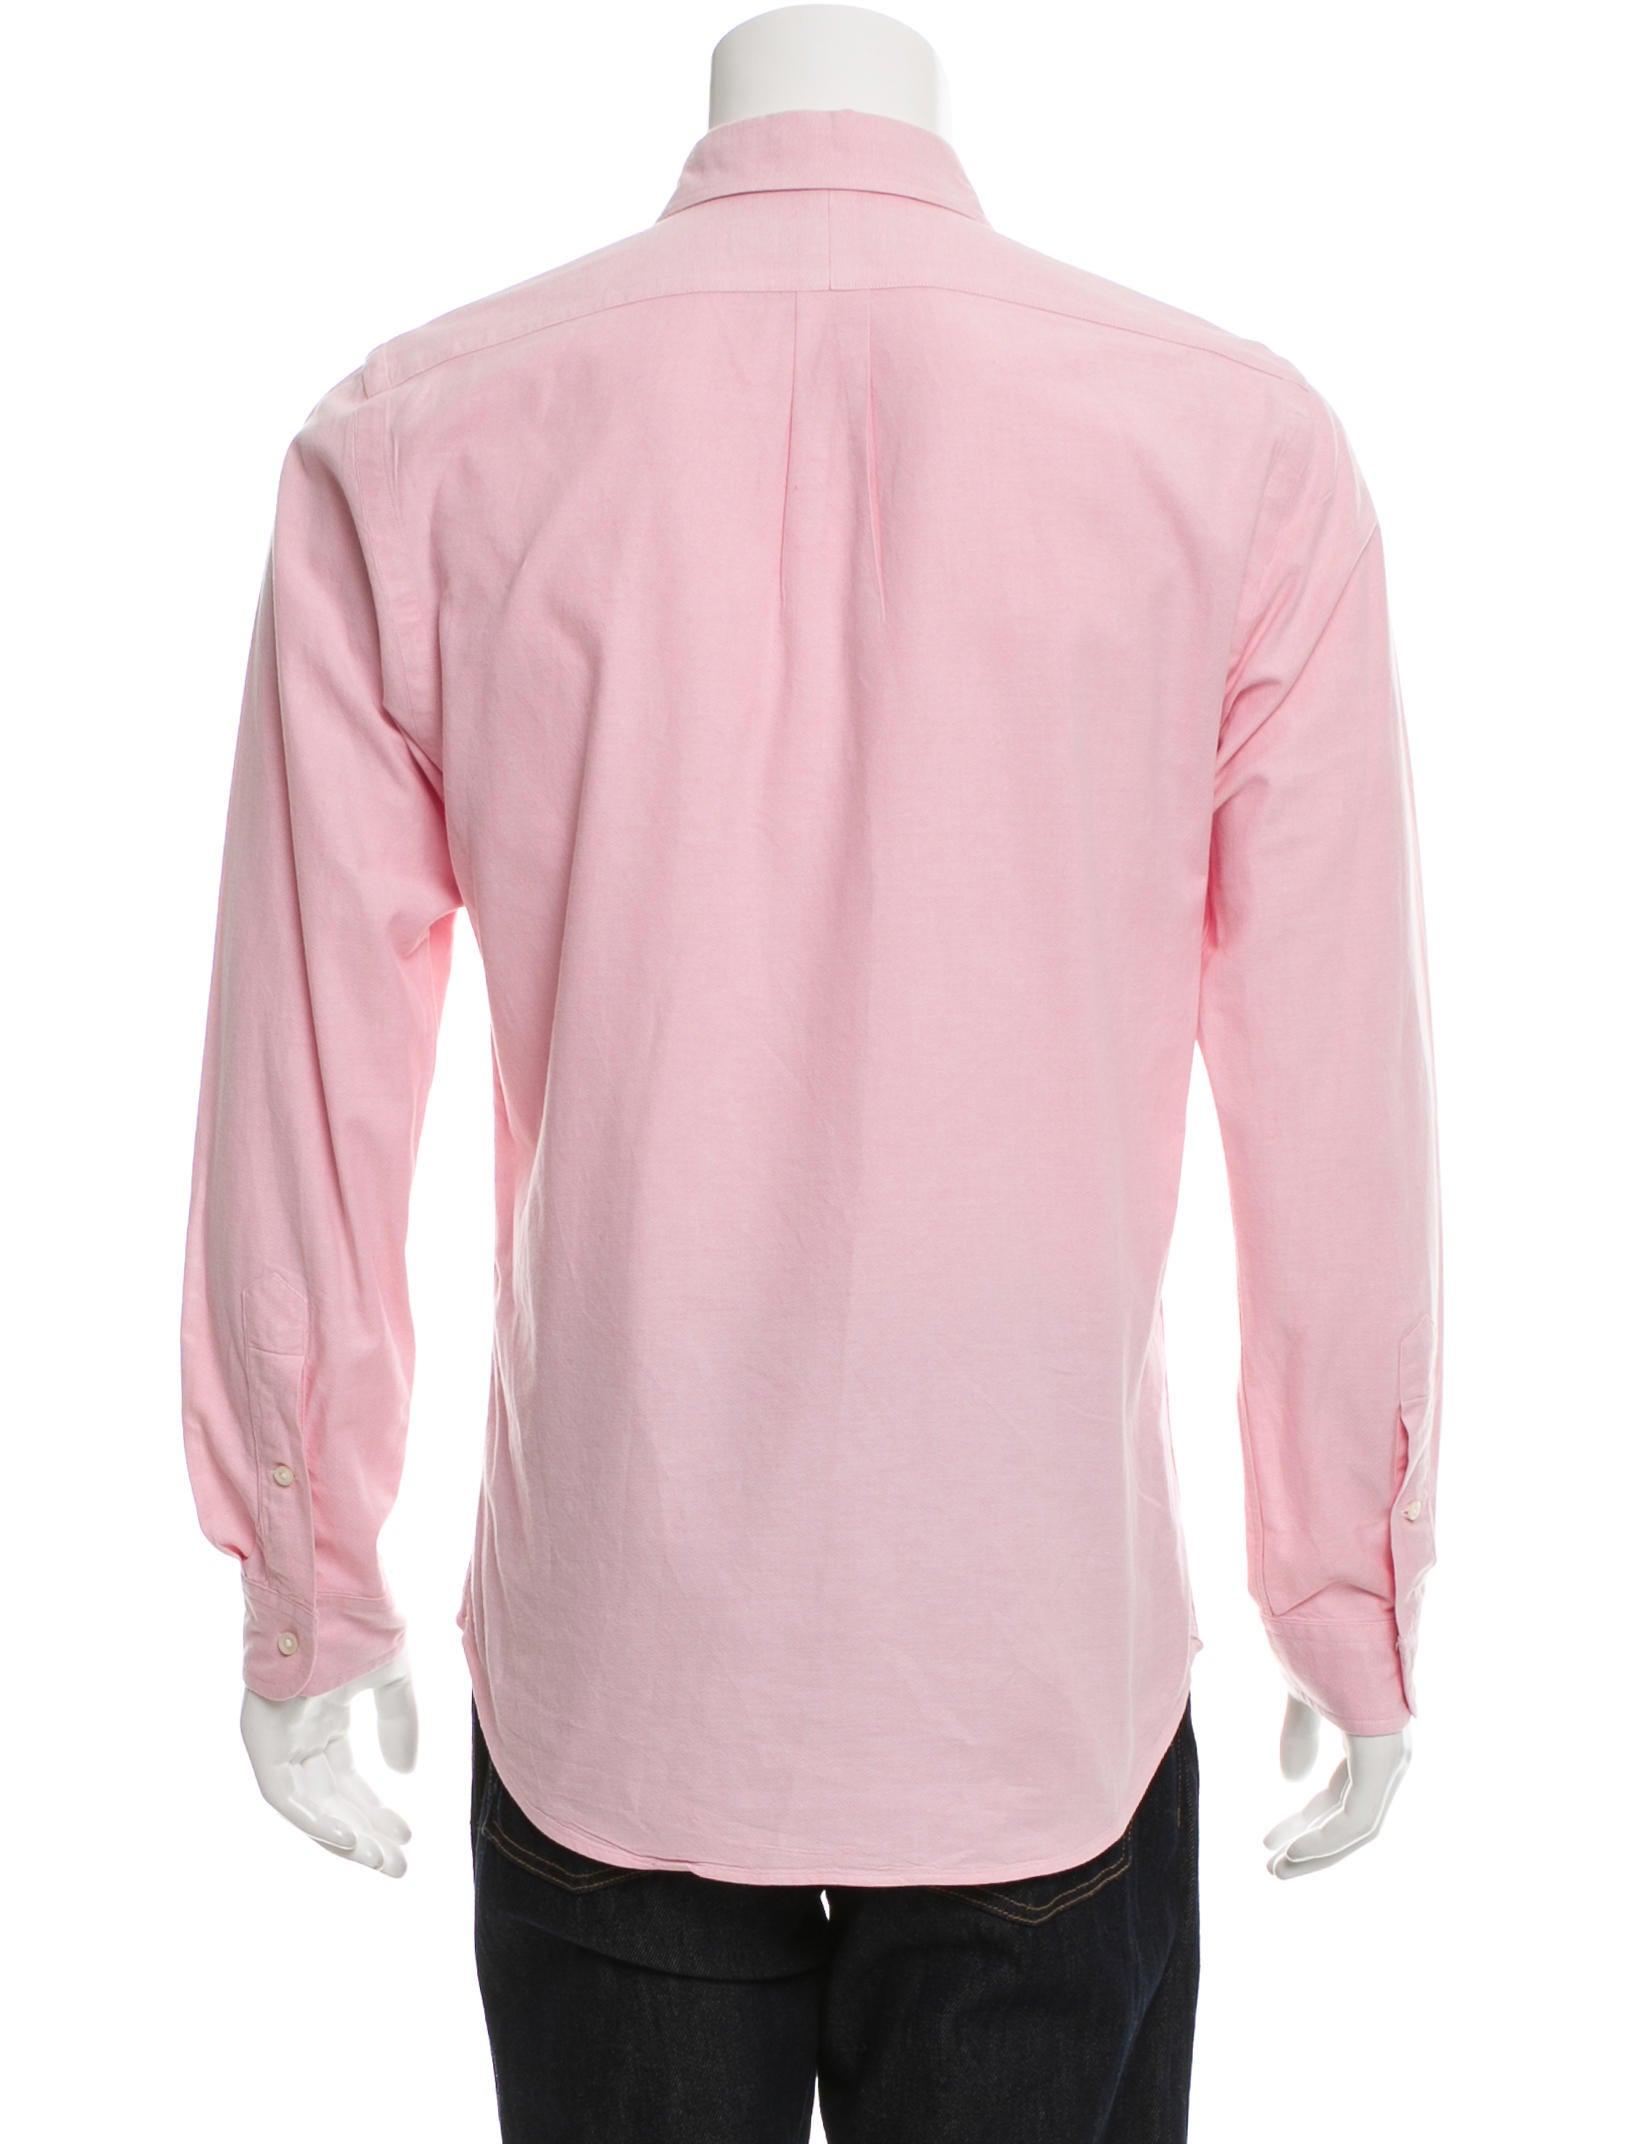 ralph lauren slim fit button up shirt clothing. Black Bedroom Furniture Sets. Home Design Ideas